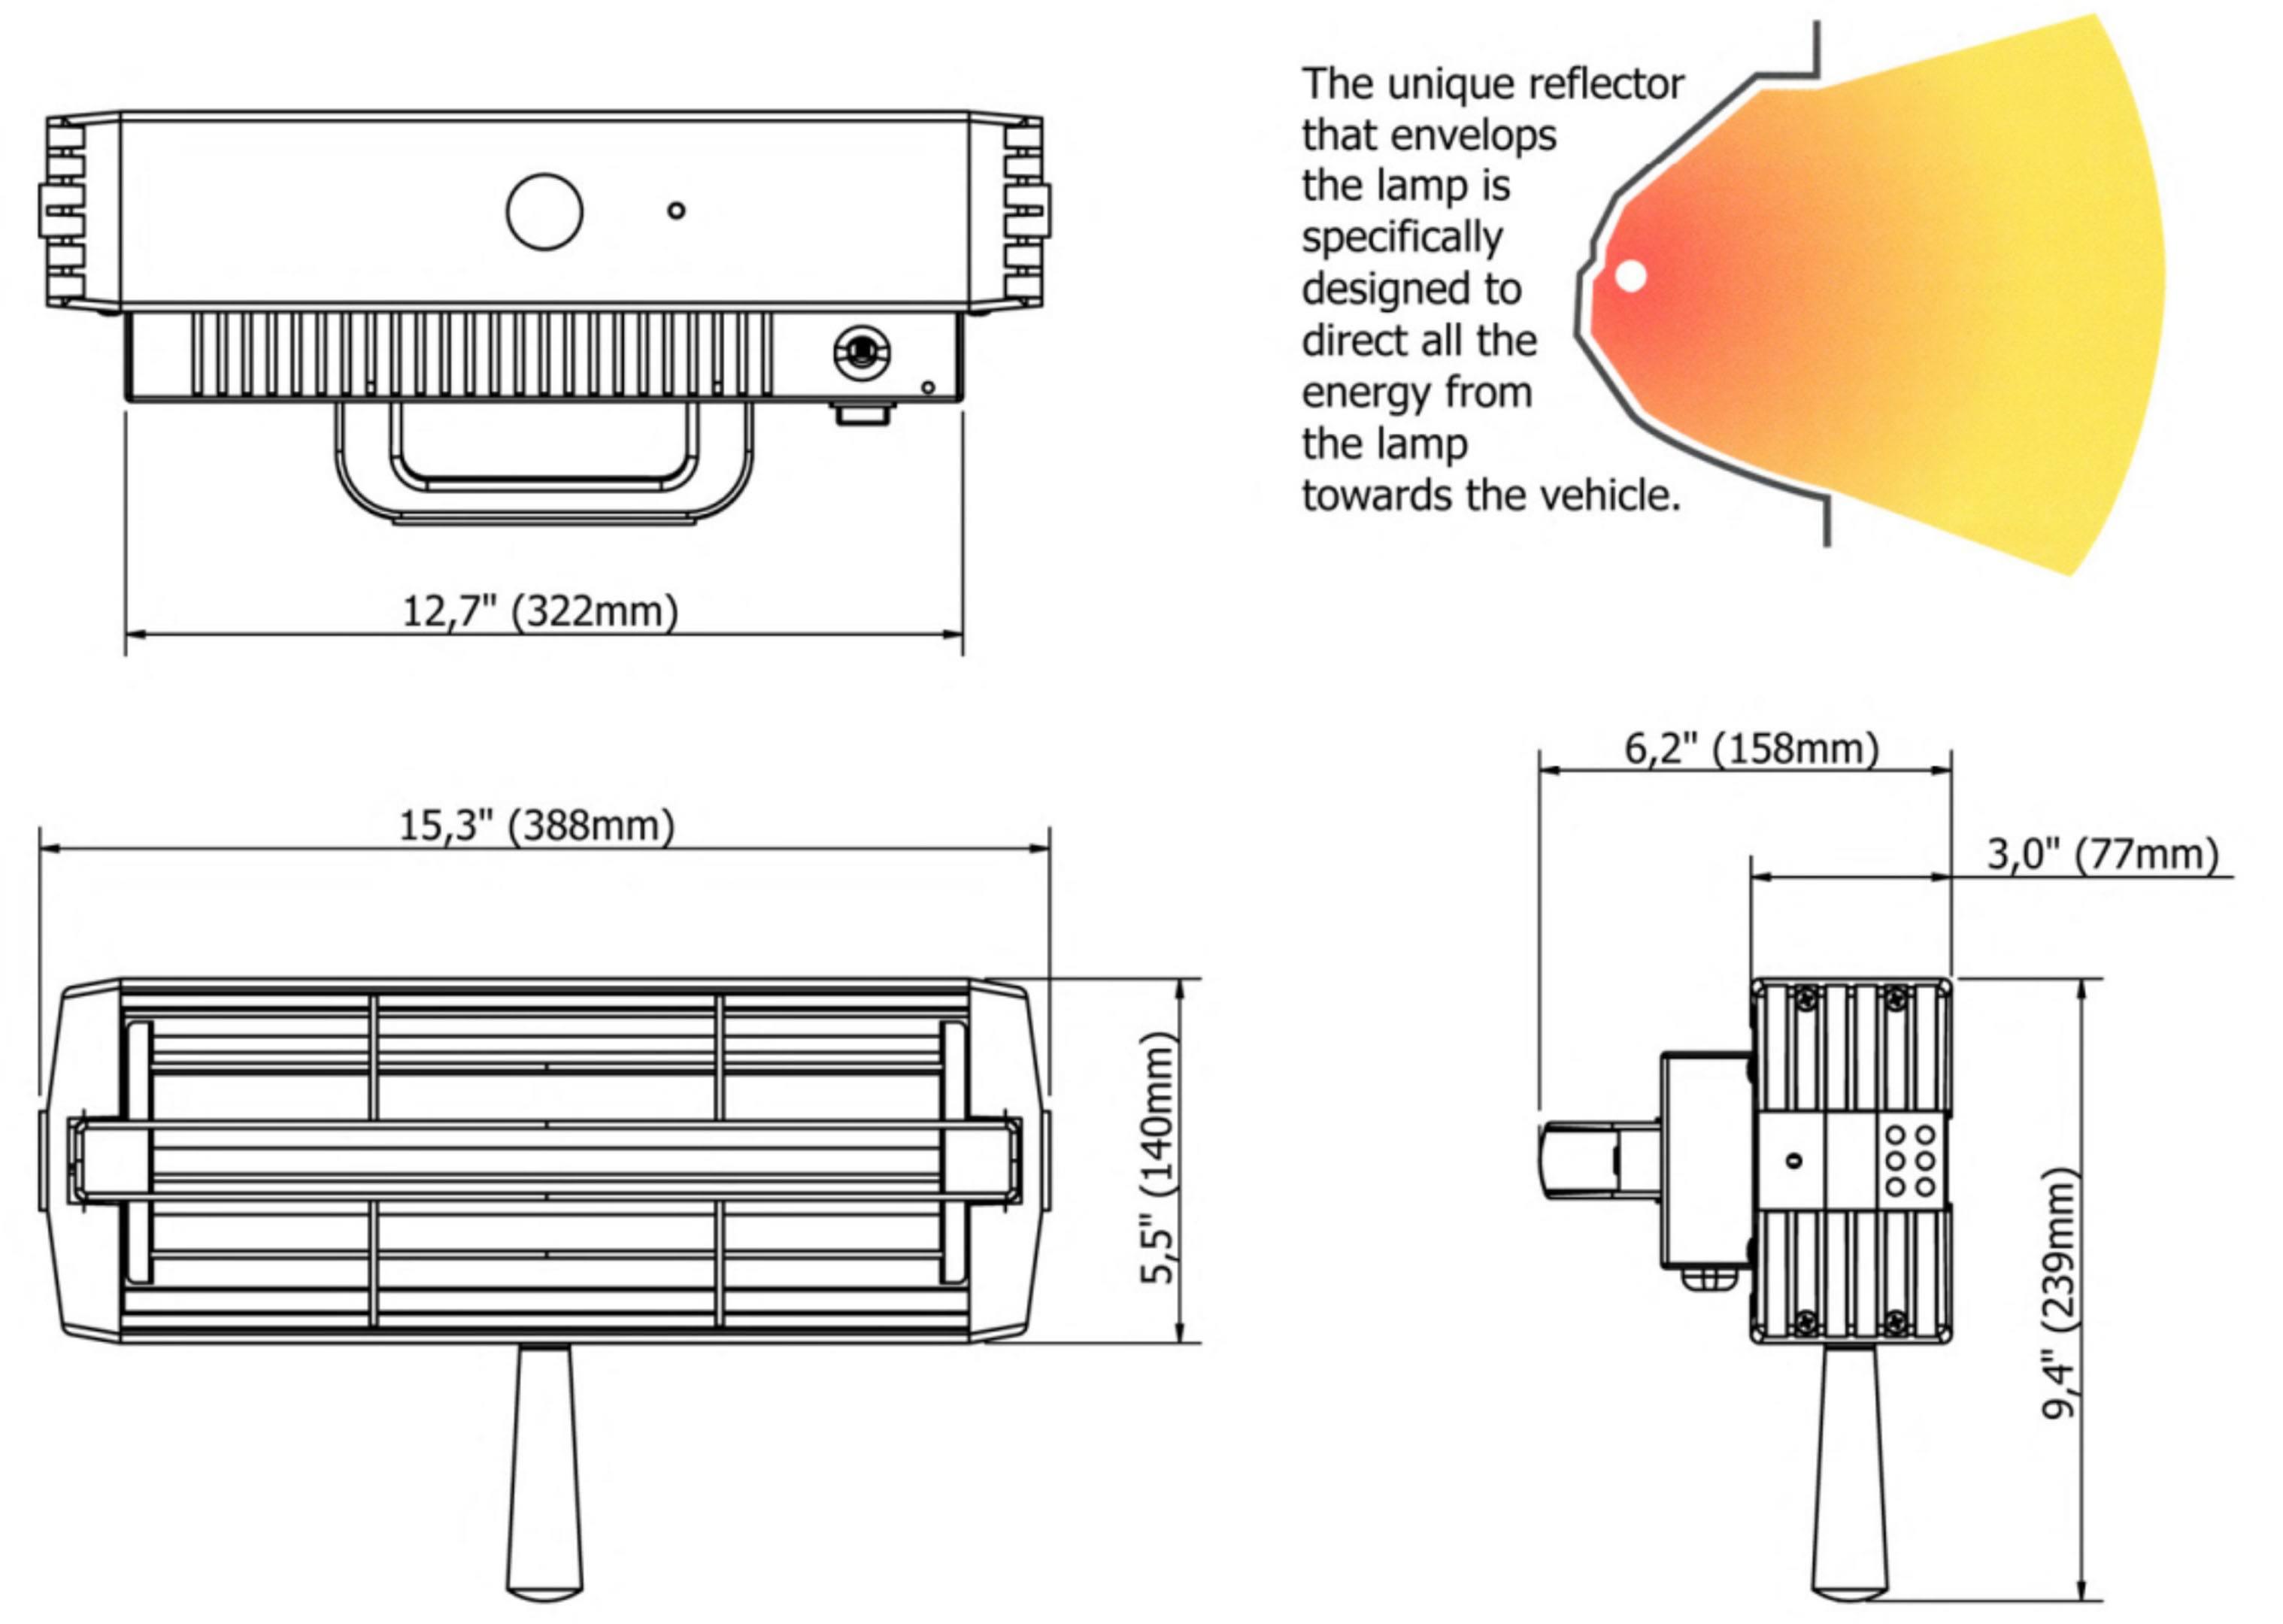 beautiful bmw motorcycle wiring diagrams ensign the best ... fuel pump wiring diagram for 1996 mustang orthman wiring diagram